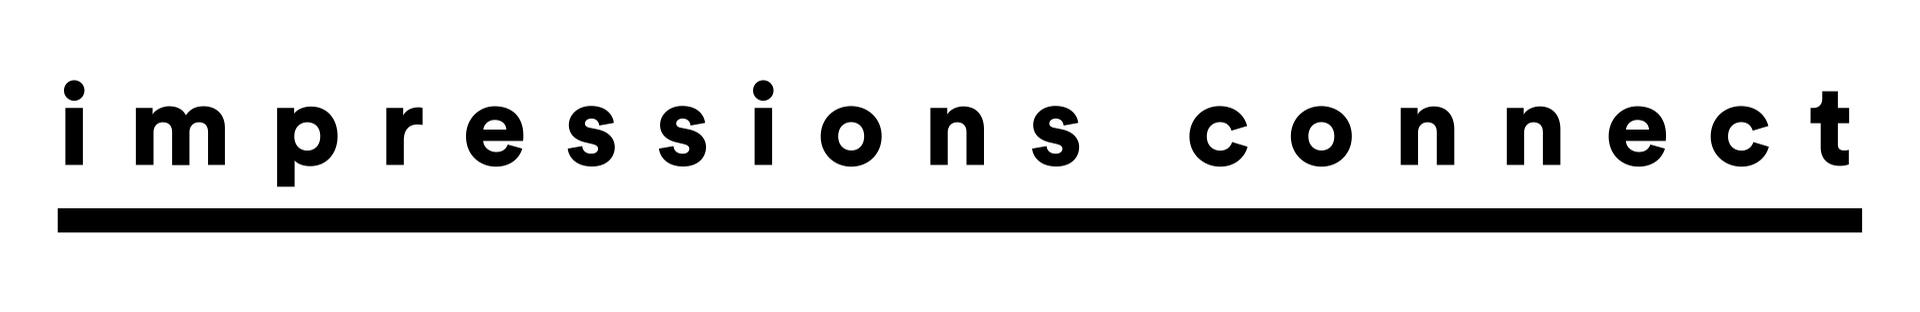 ImpConnect-one-line-black